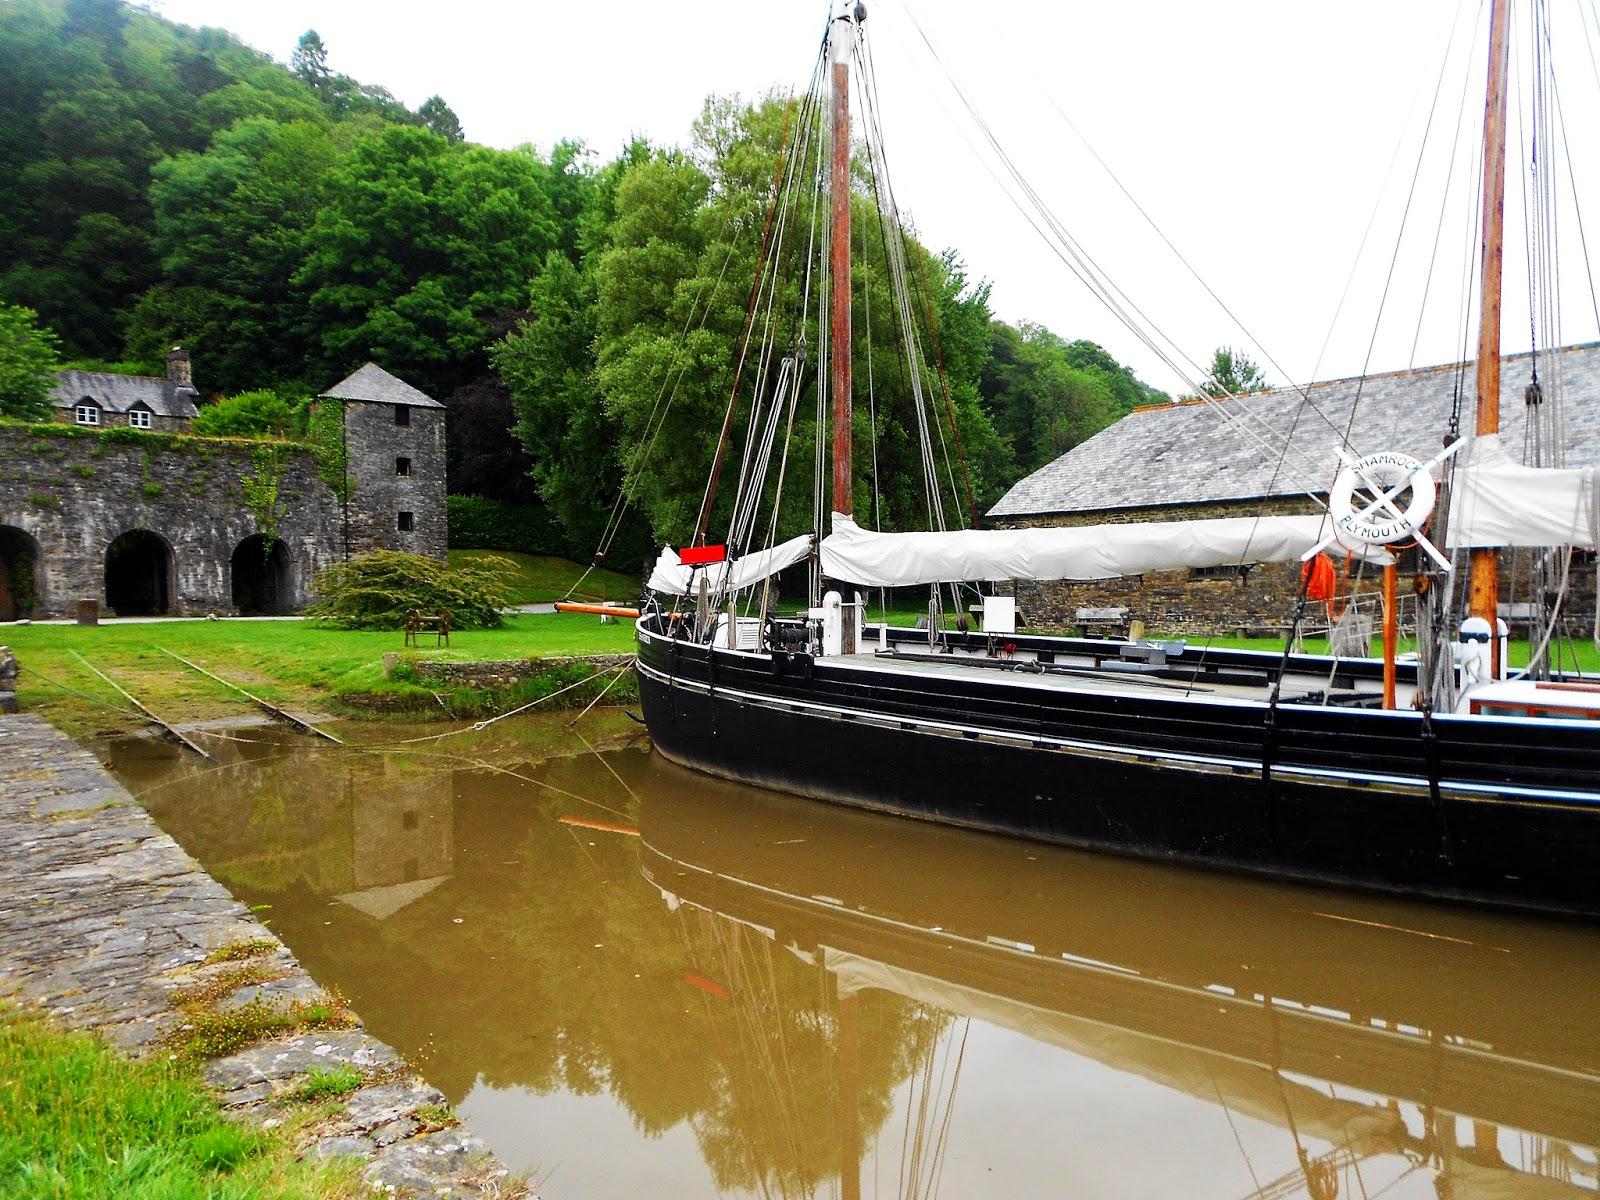 "alt=""shamrock tamar sailing barge at cotehele quay"""